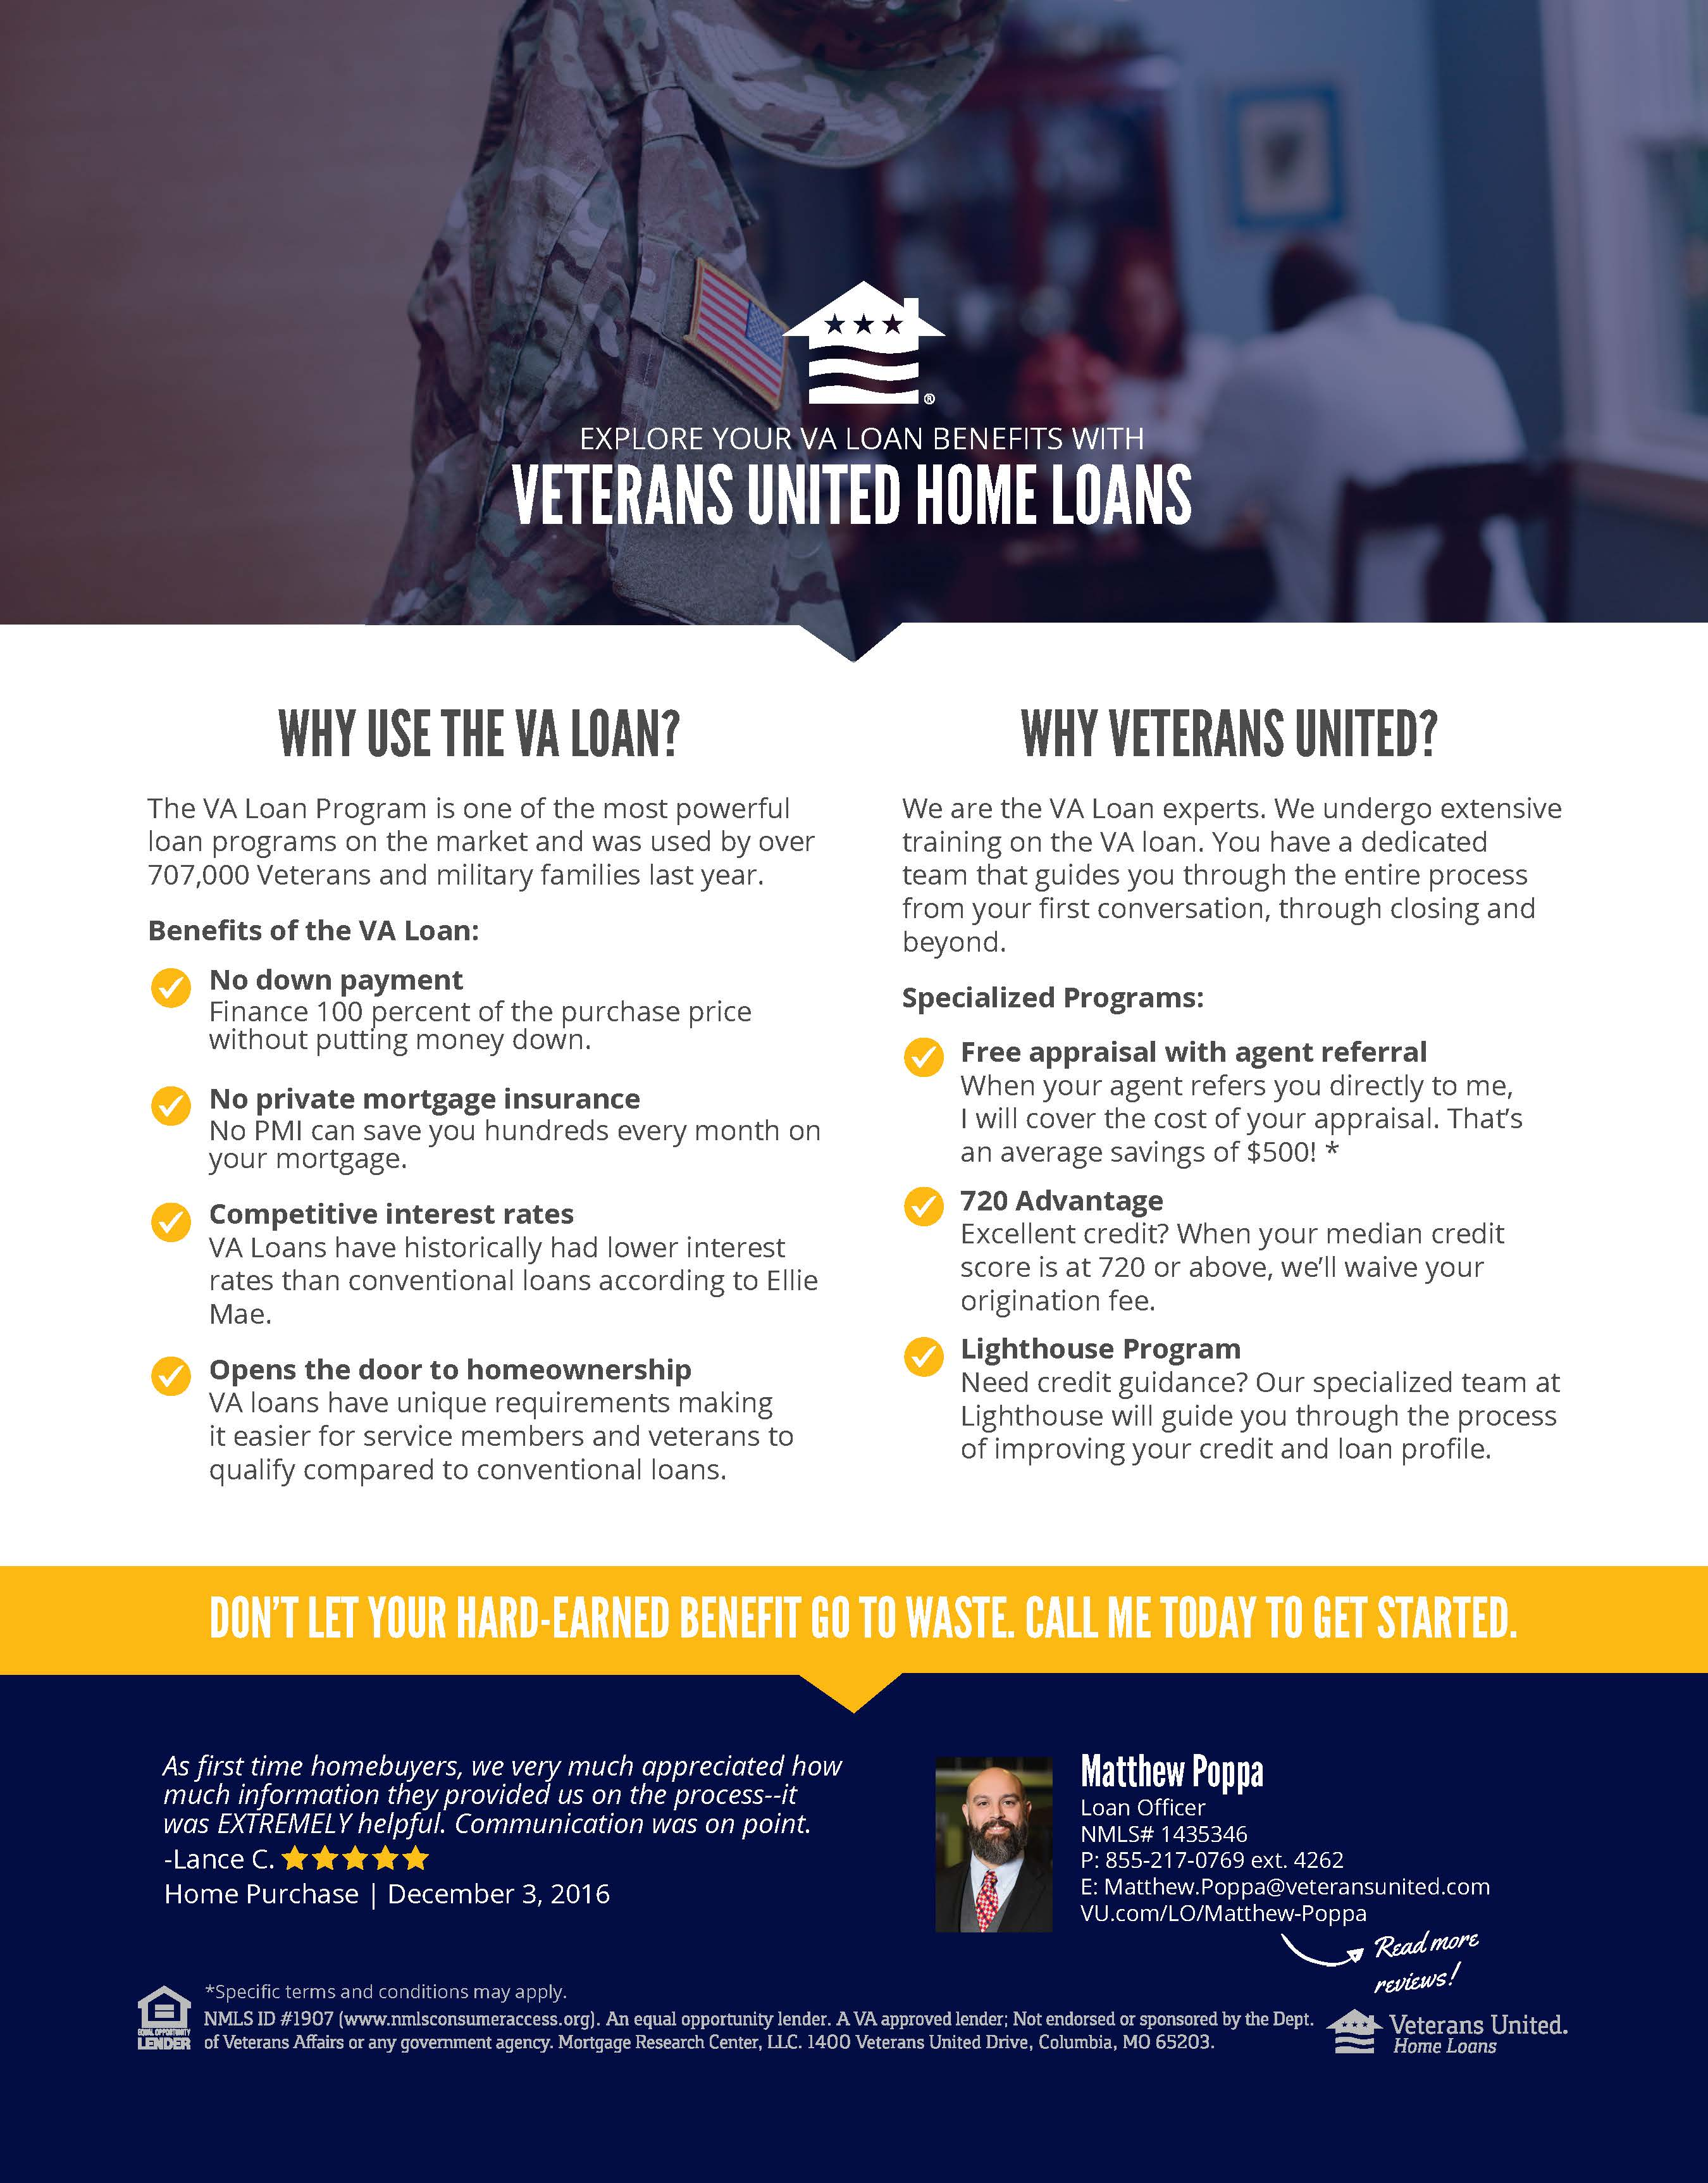 Payday loans sunnyside wa image 8